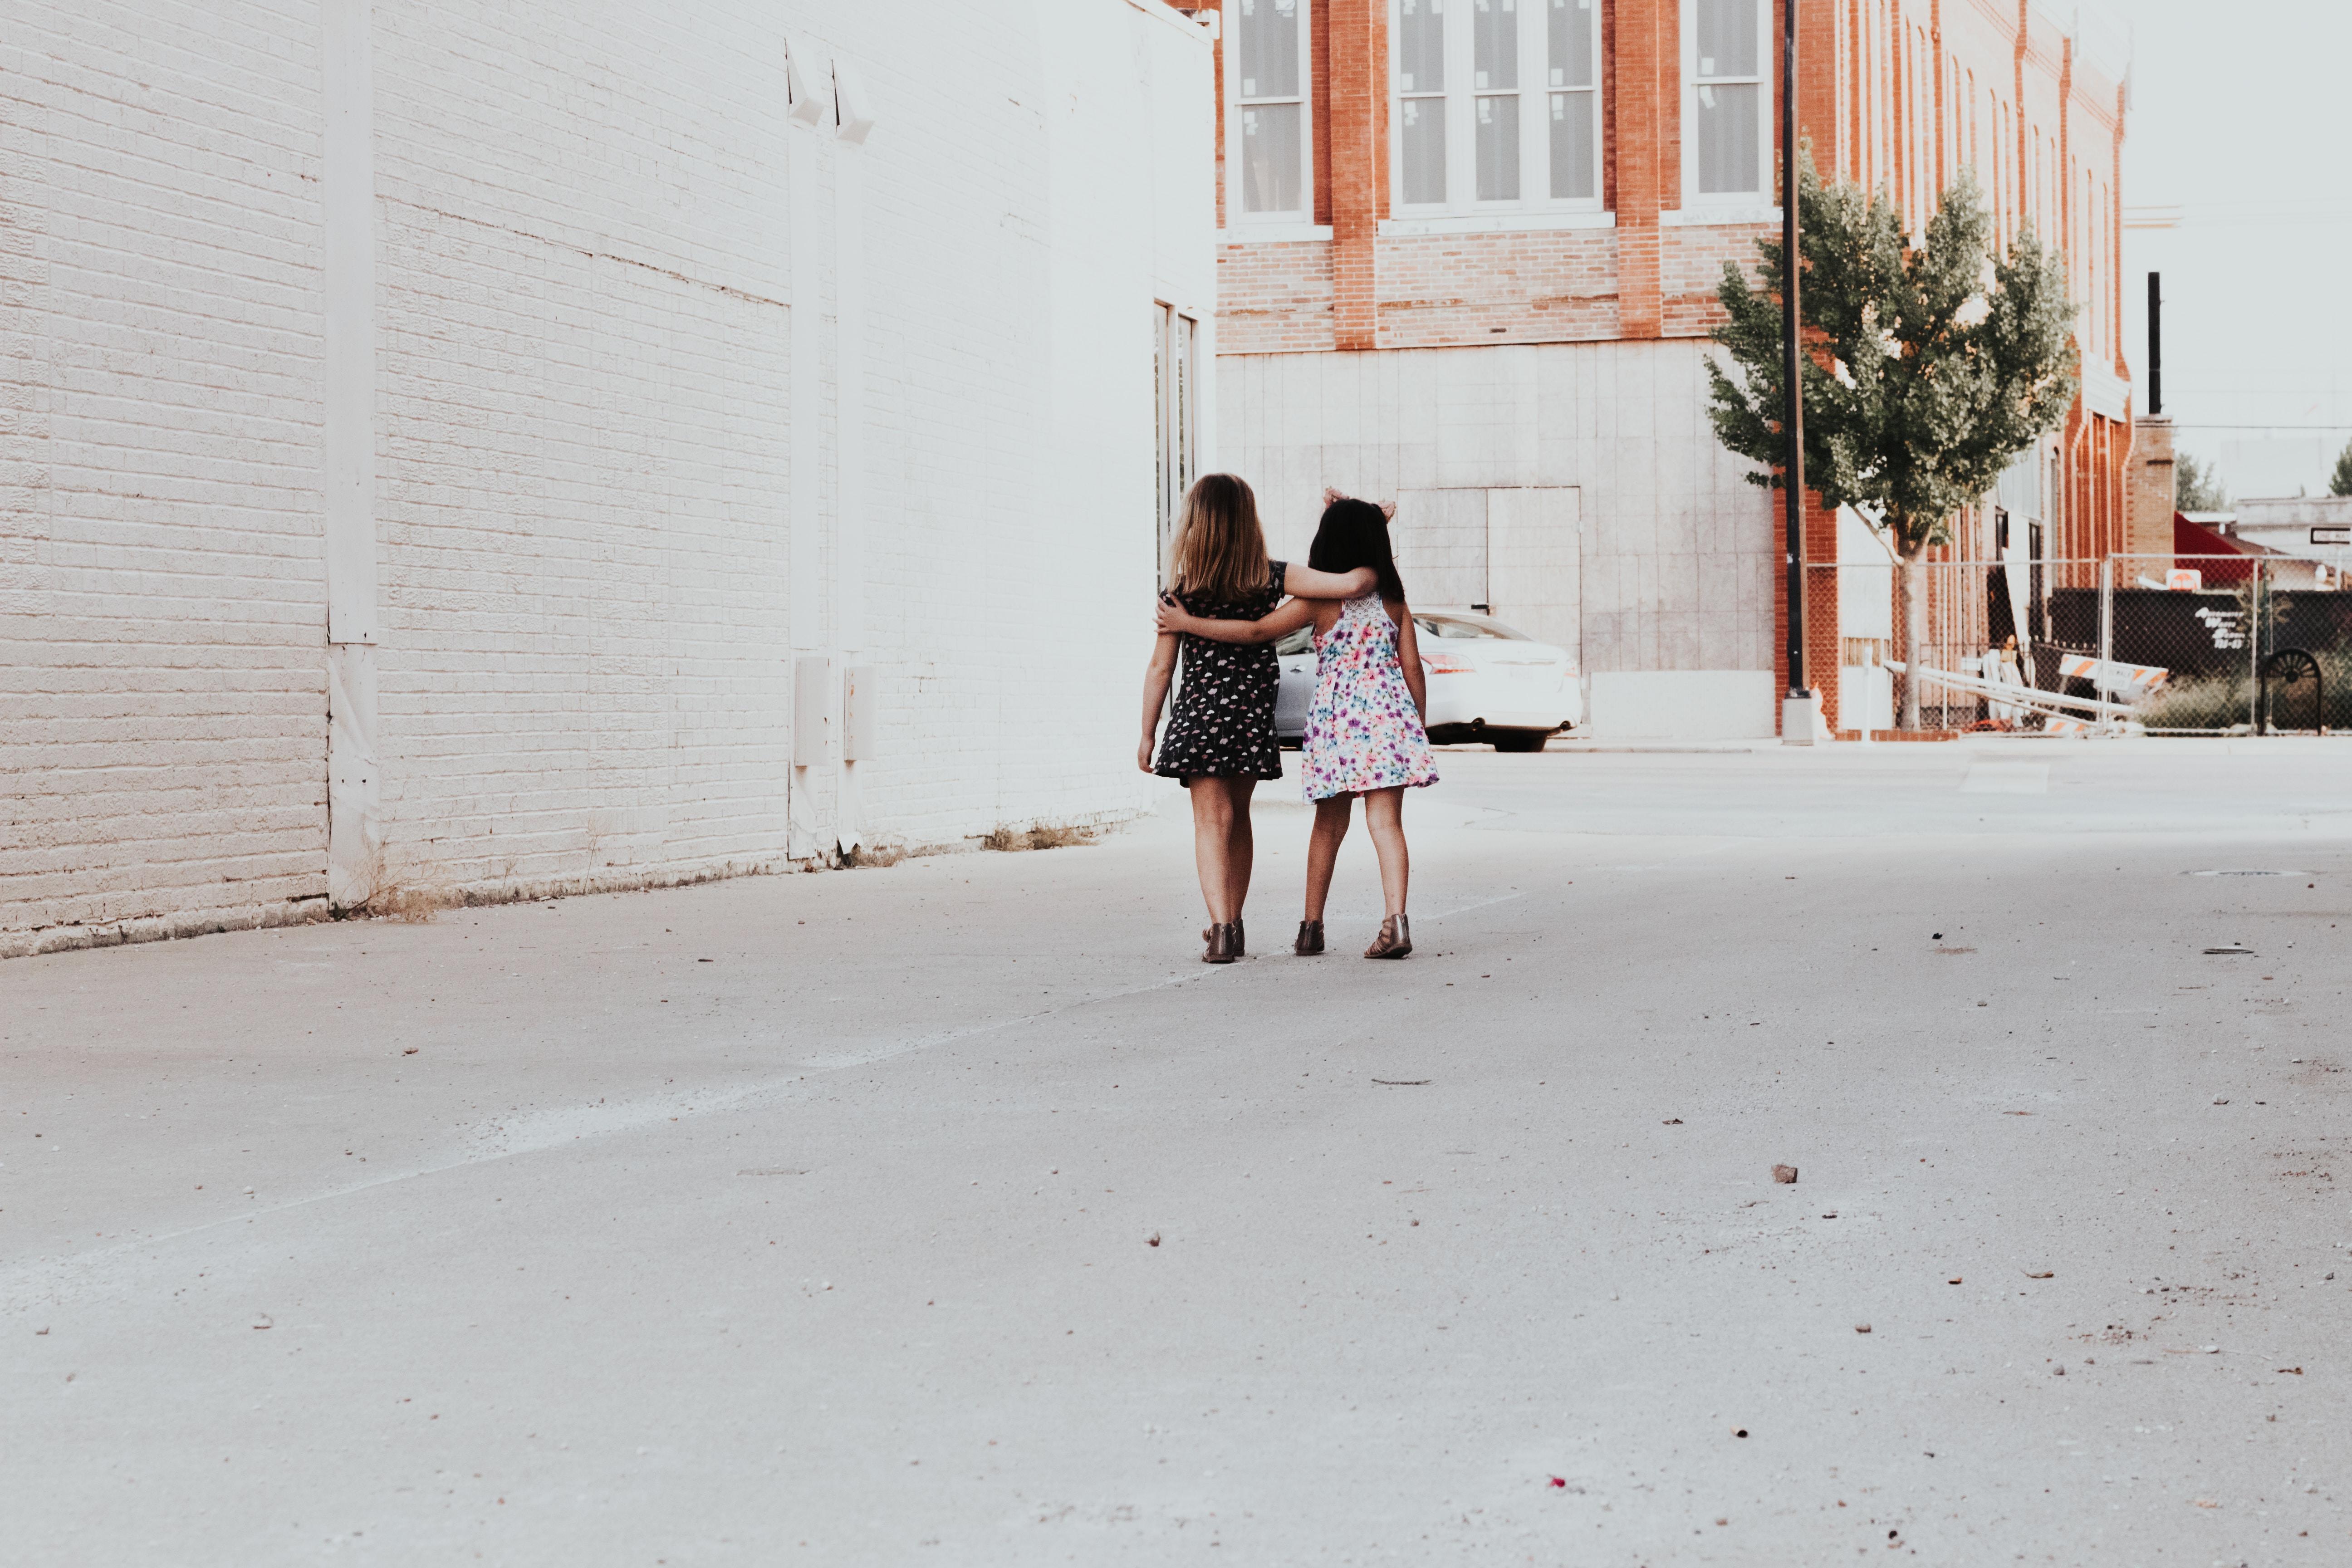 Dear Sister, stories